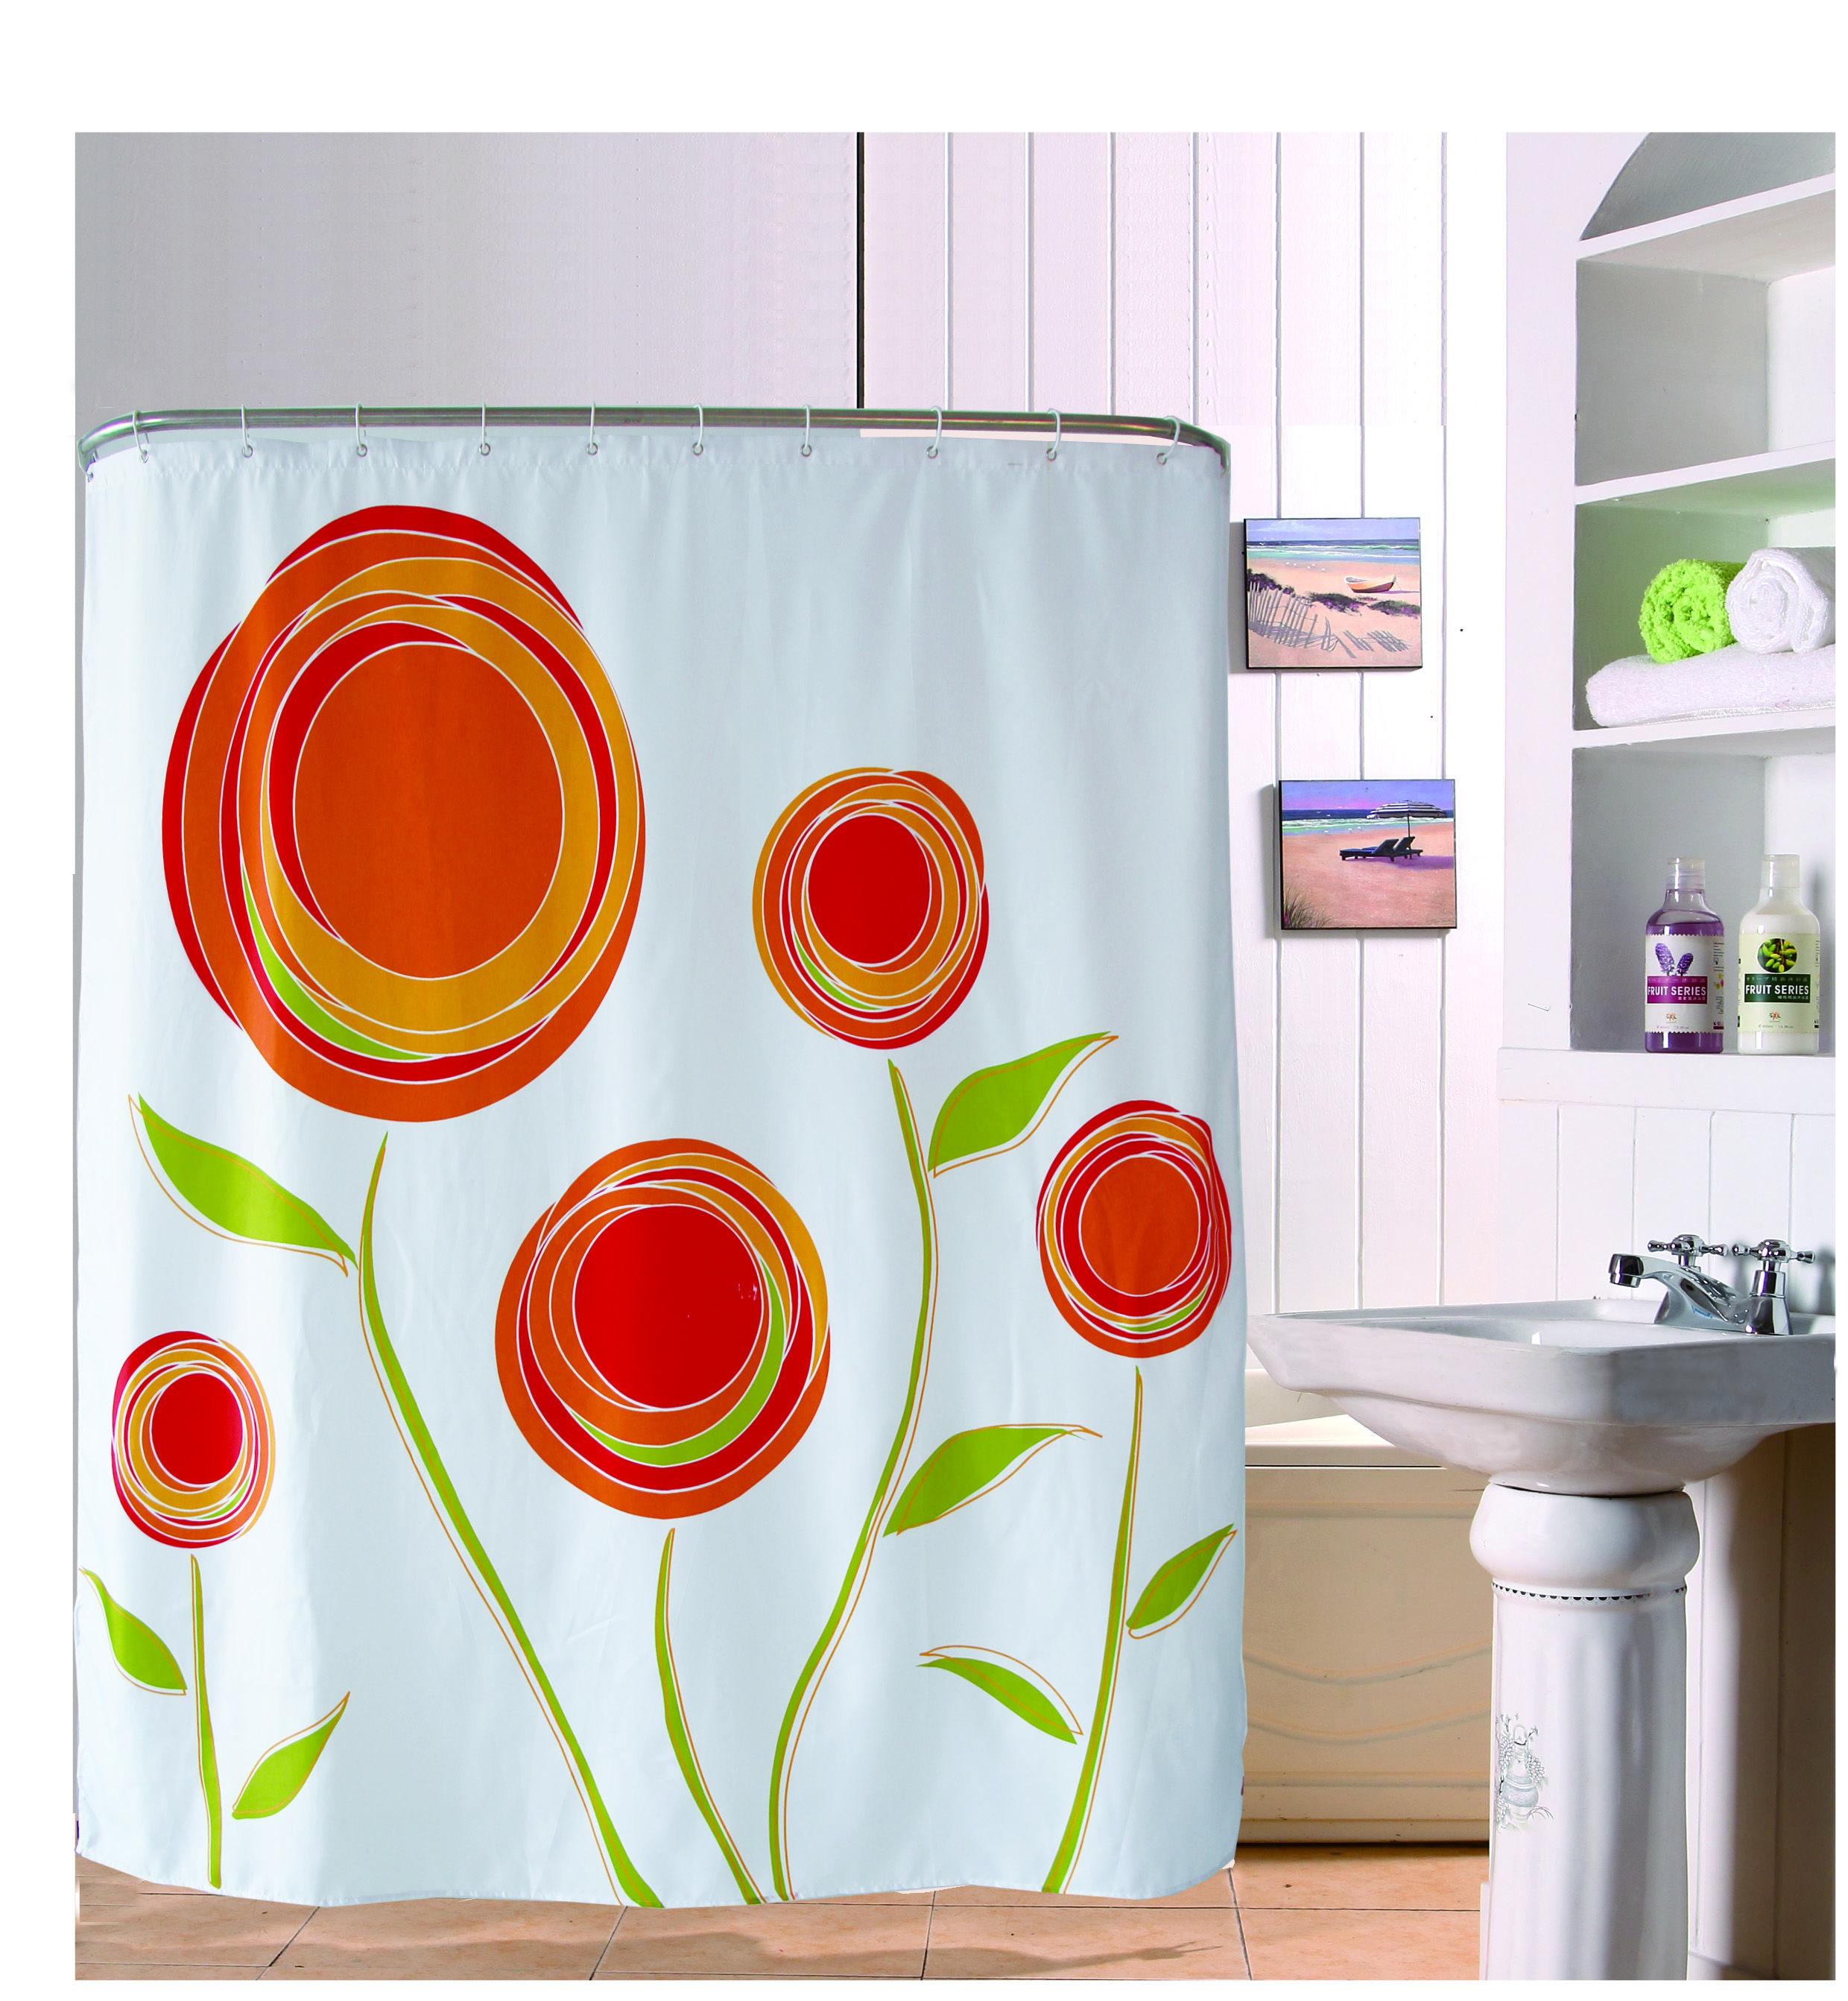 Elegant 180*180cm Simple Design Style Toilet Valance Printed Orange Flower Shower  Curtains Washable Kitchen Drapes